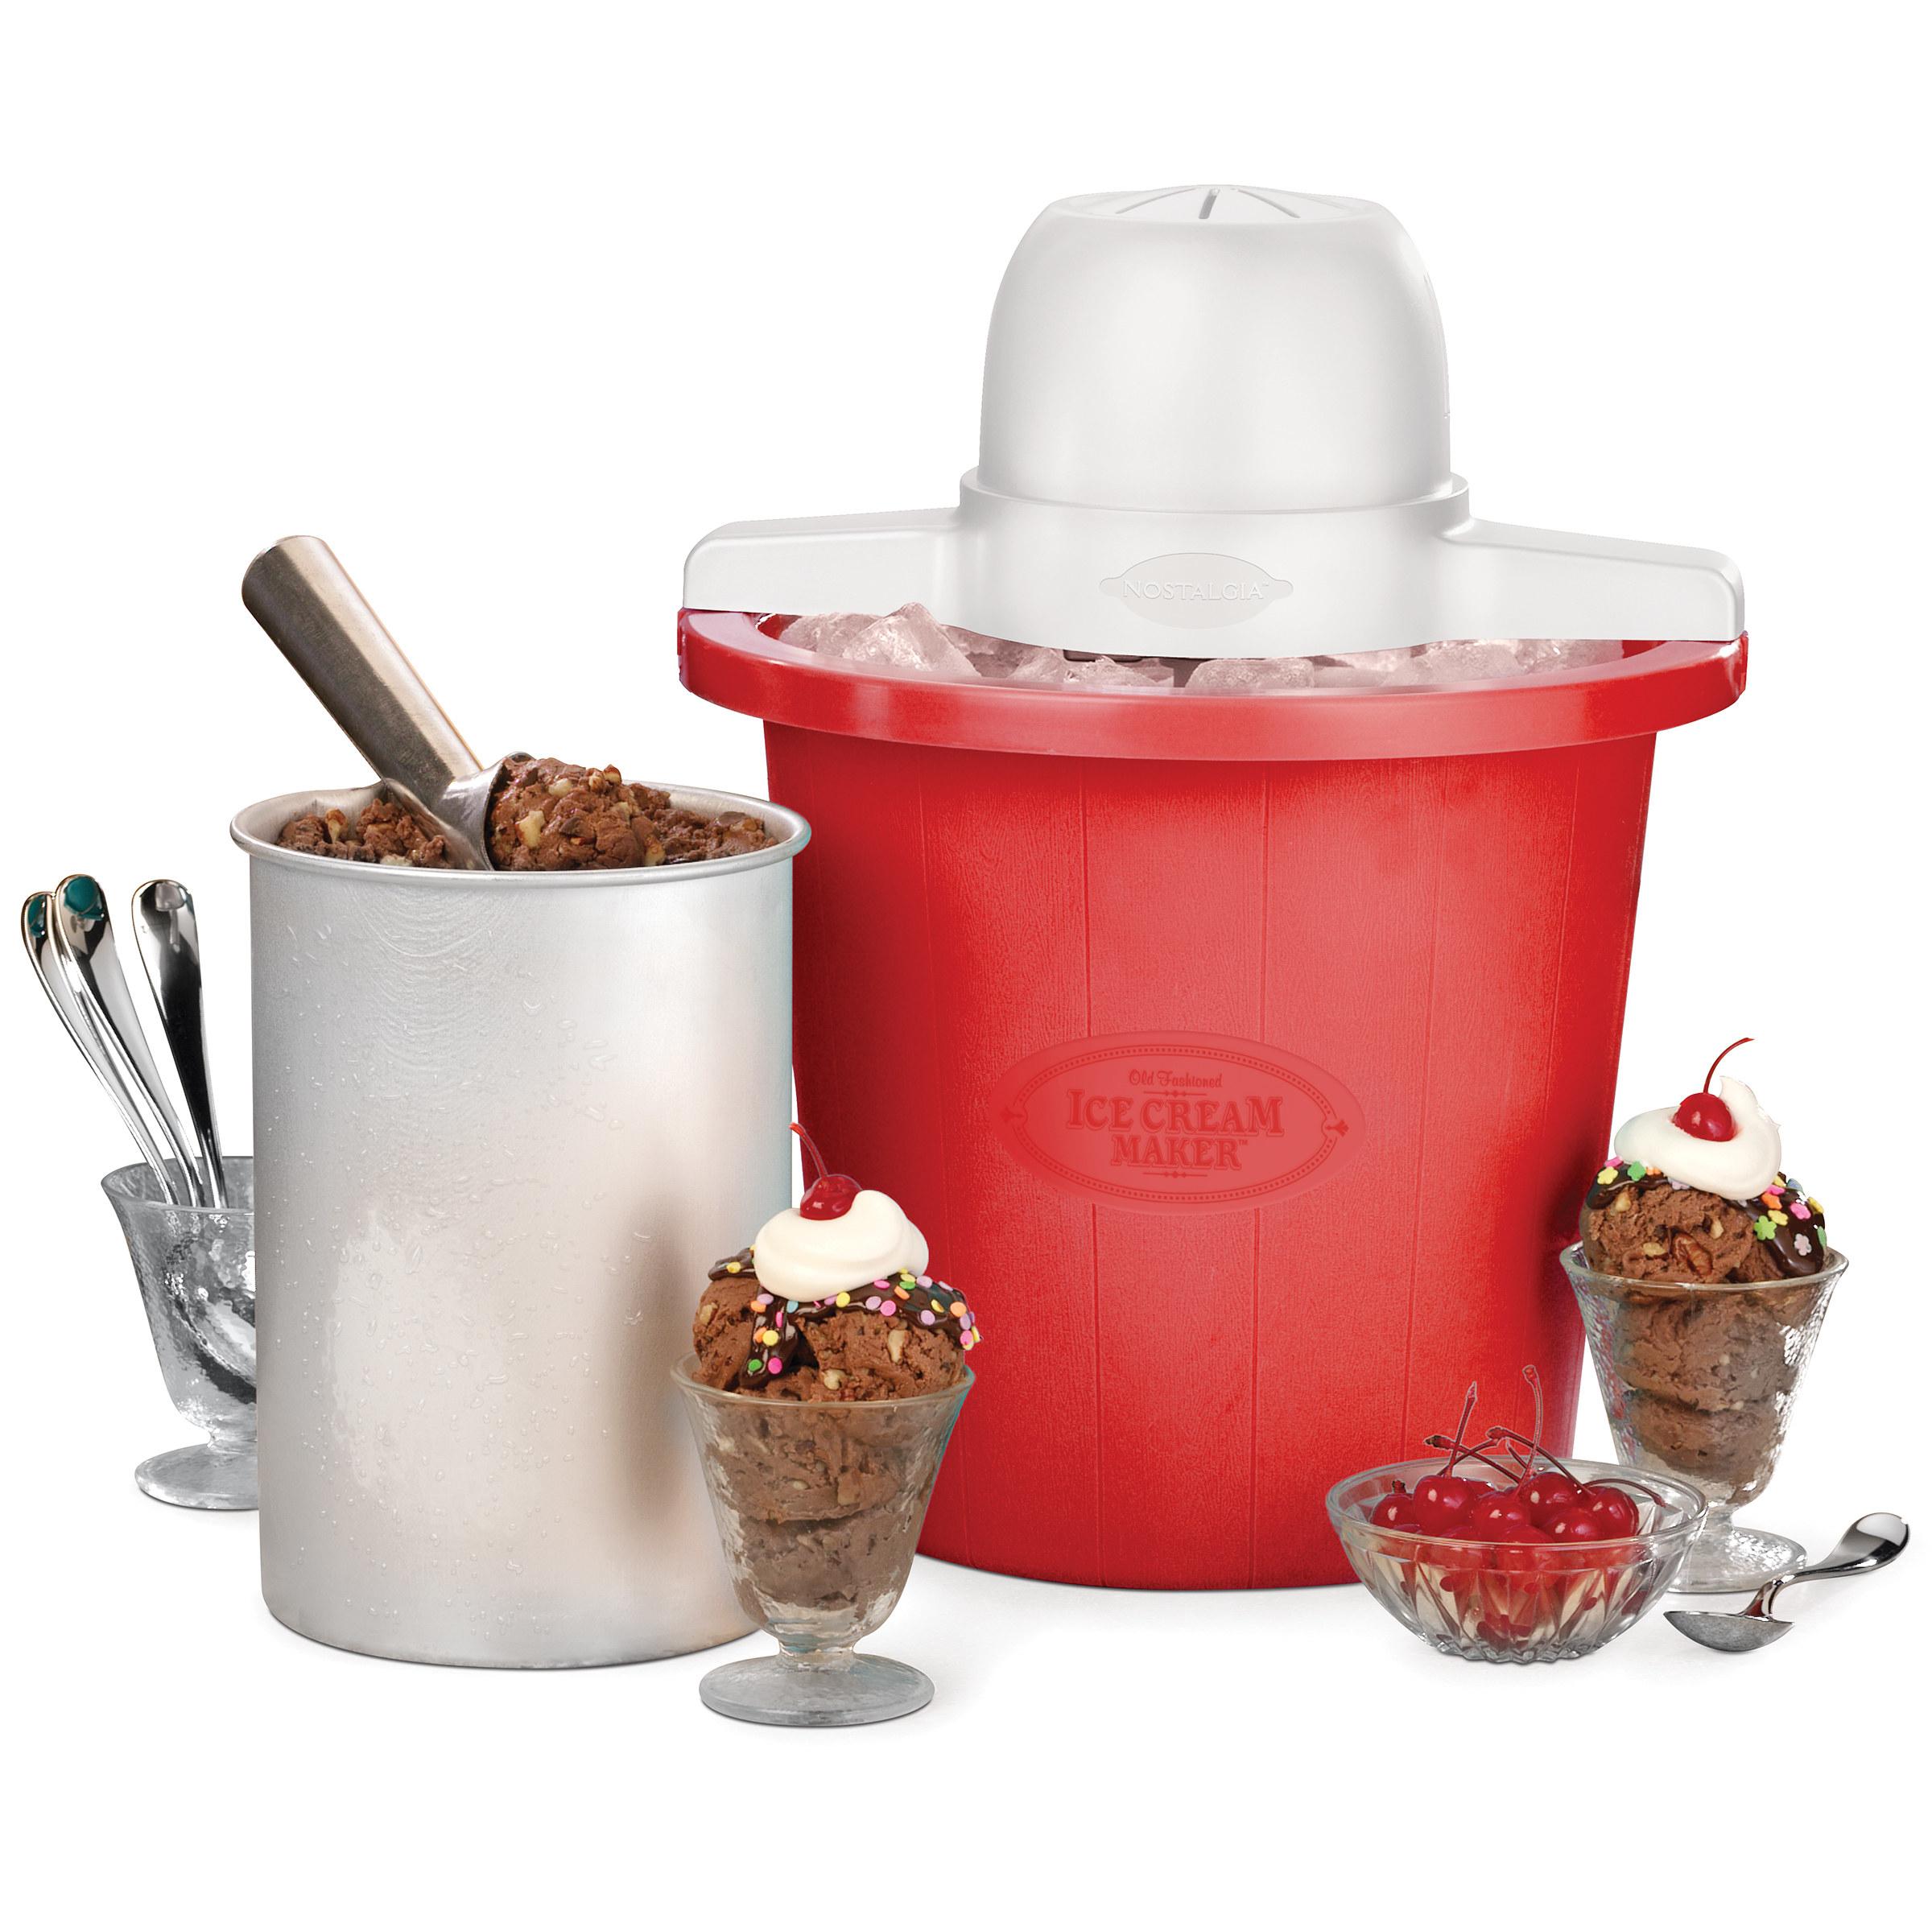 red ice cream maker with chocolate ice cream around it